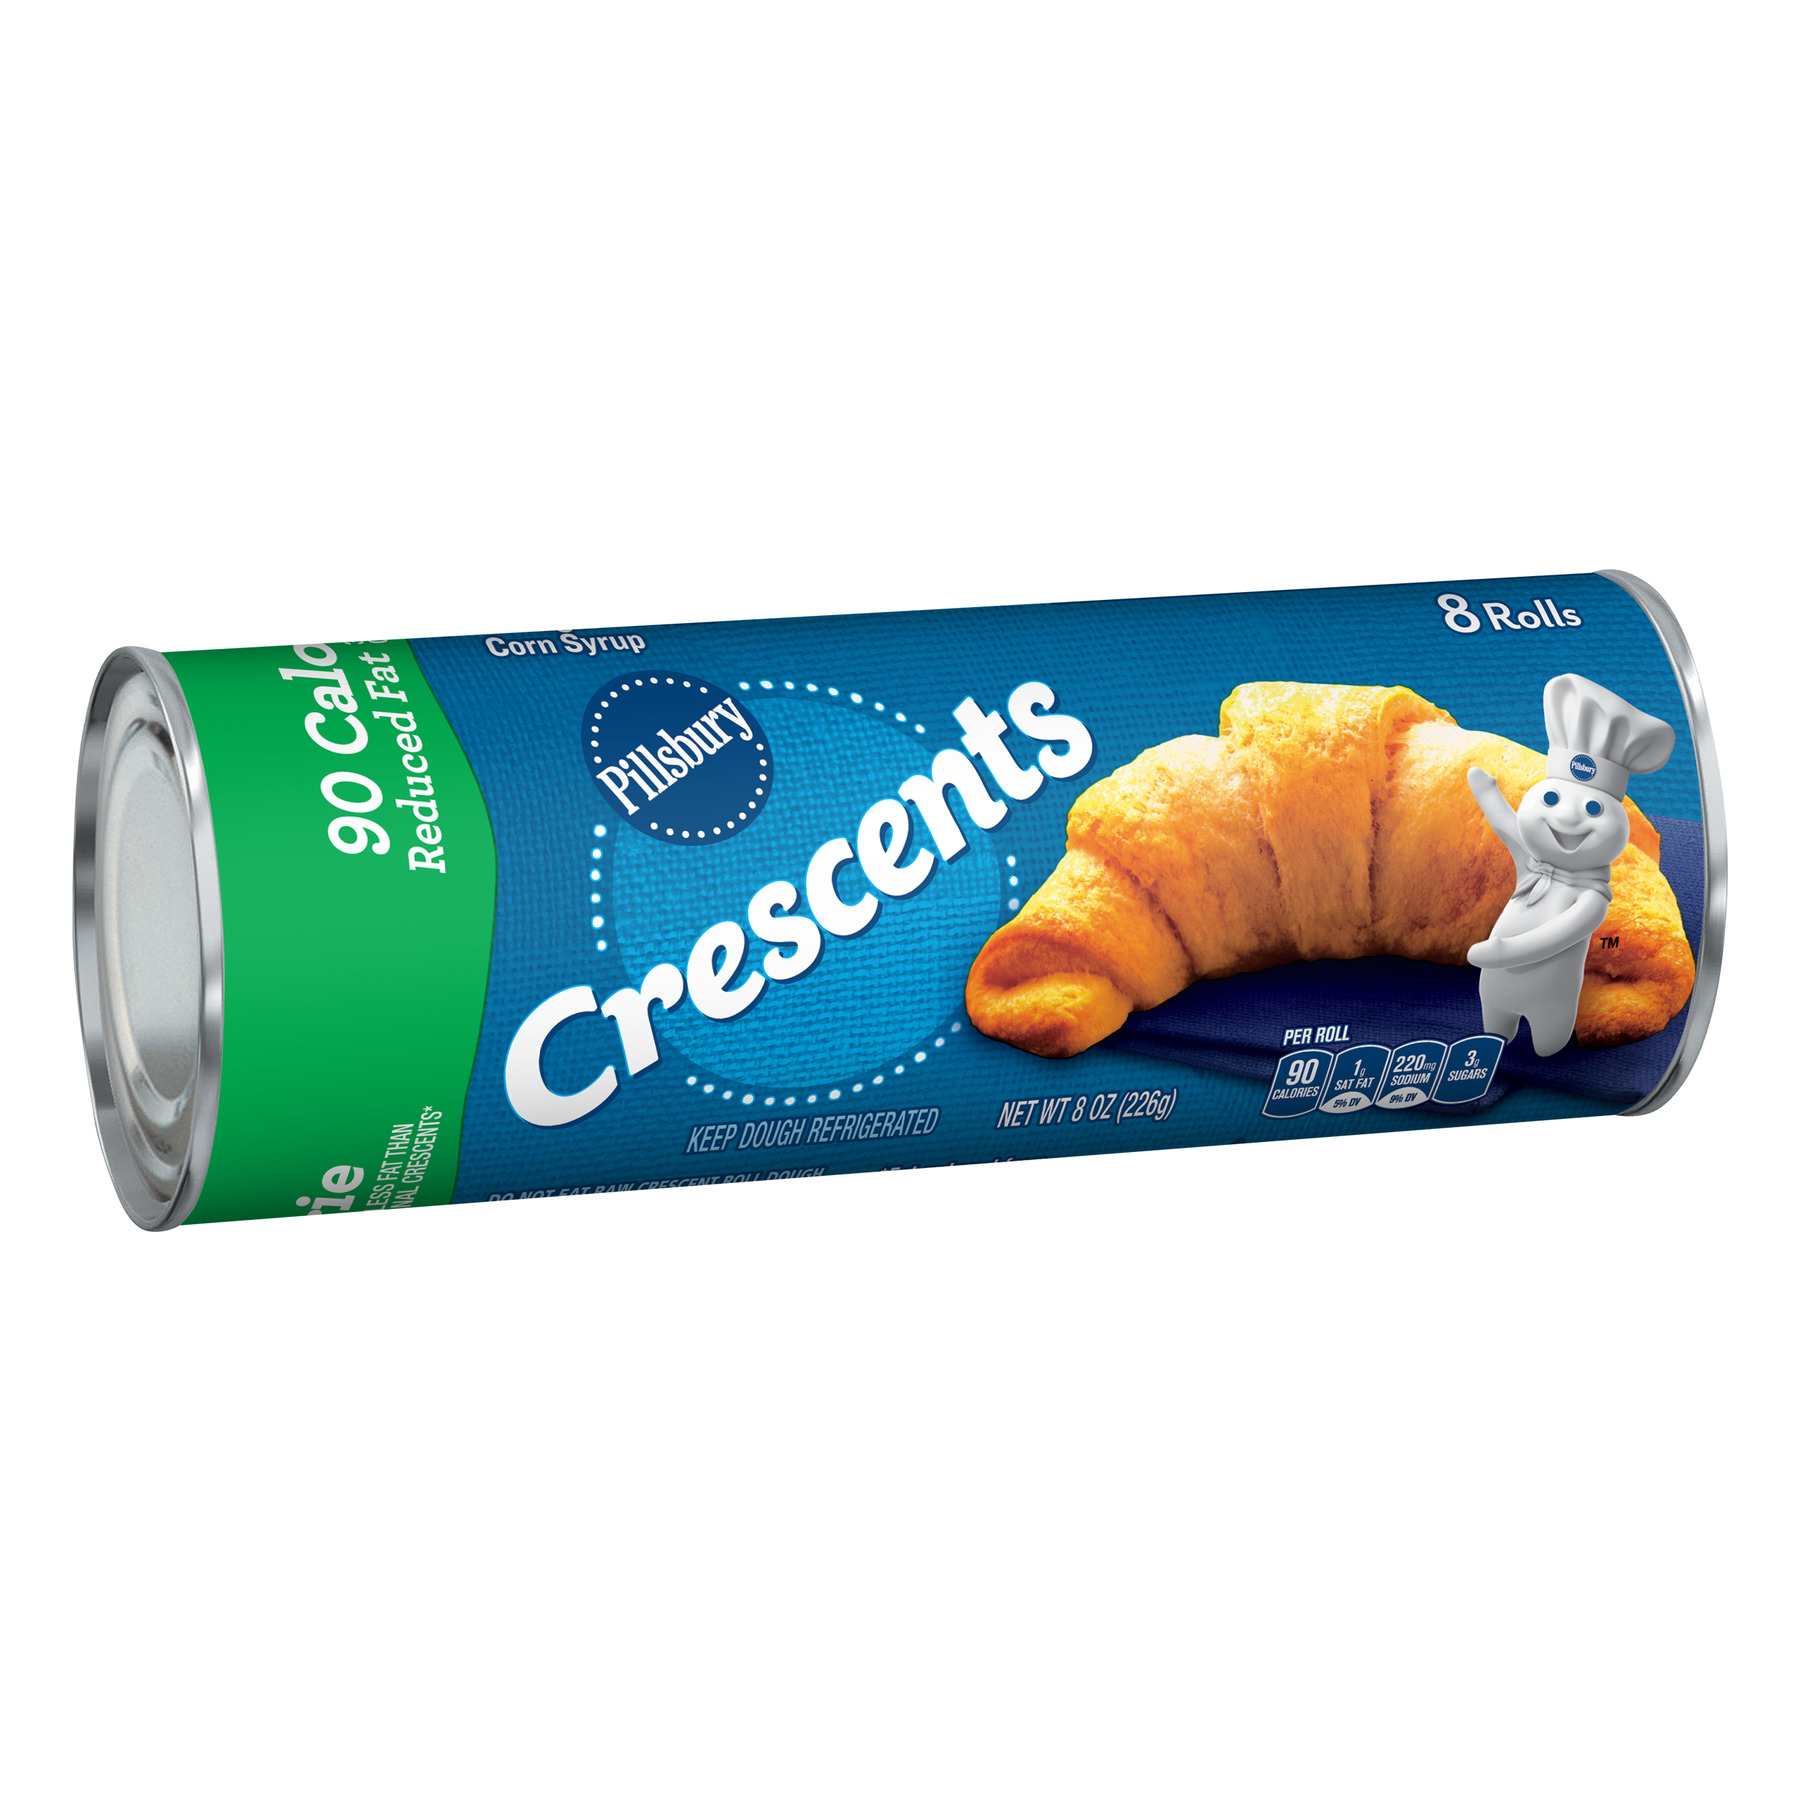 Pillsbury  Crescent Rolls Reduced Fat, 8 Count, 8 oz